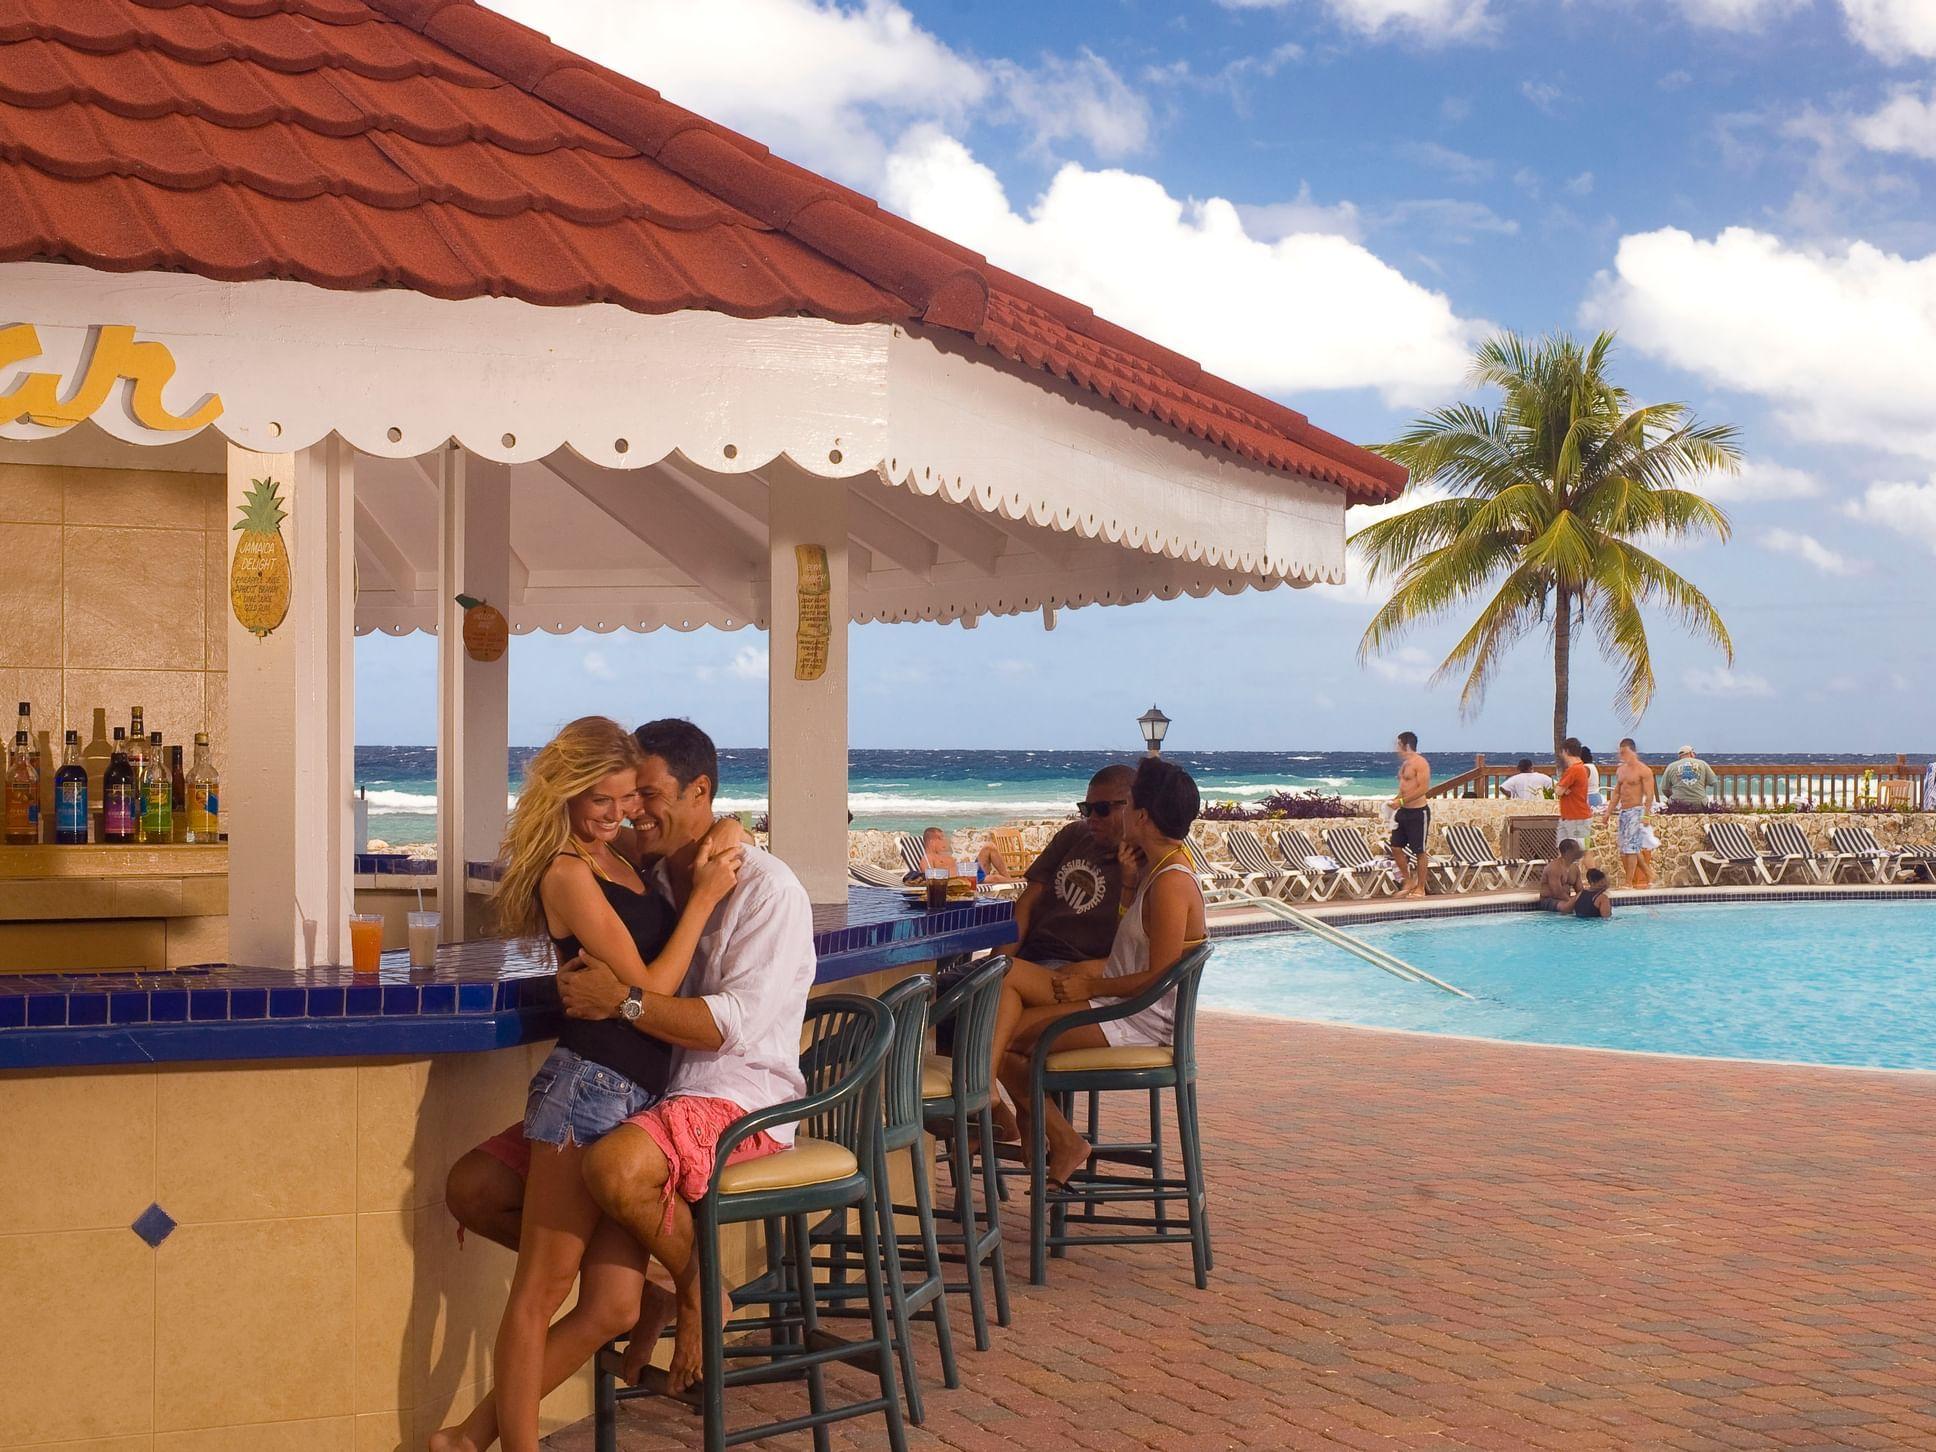 Exterior of Barefoot Bar & Grill at Holiday Inn Montego Bay